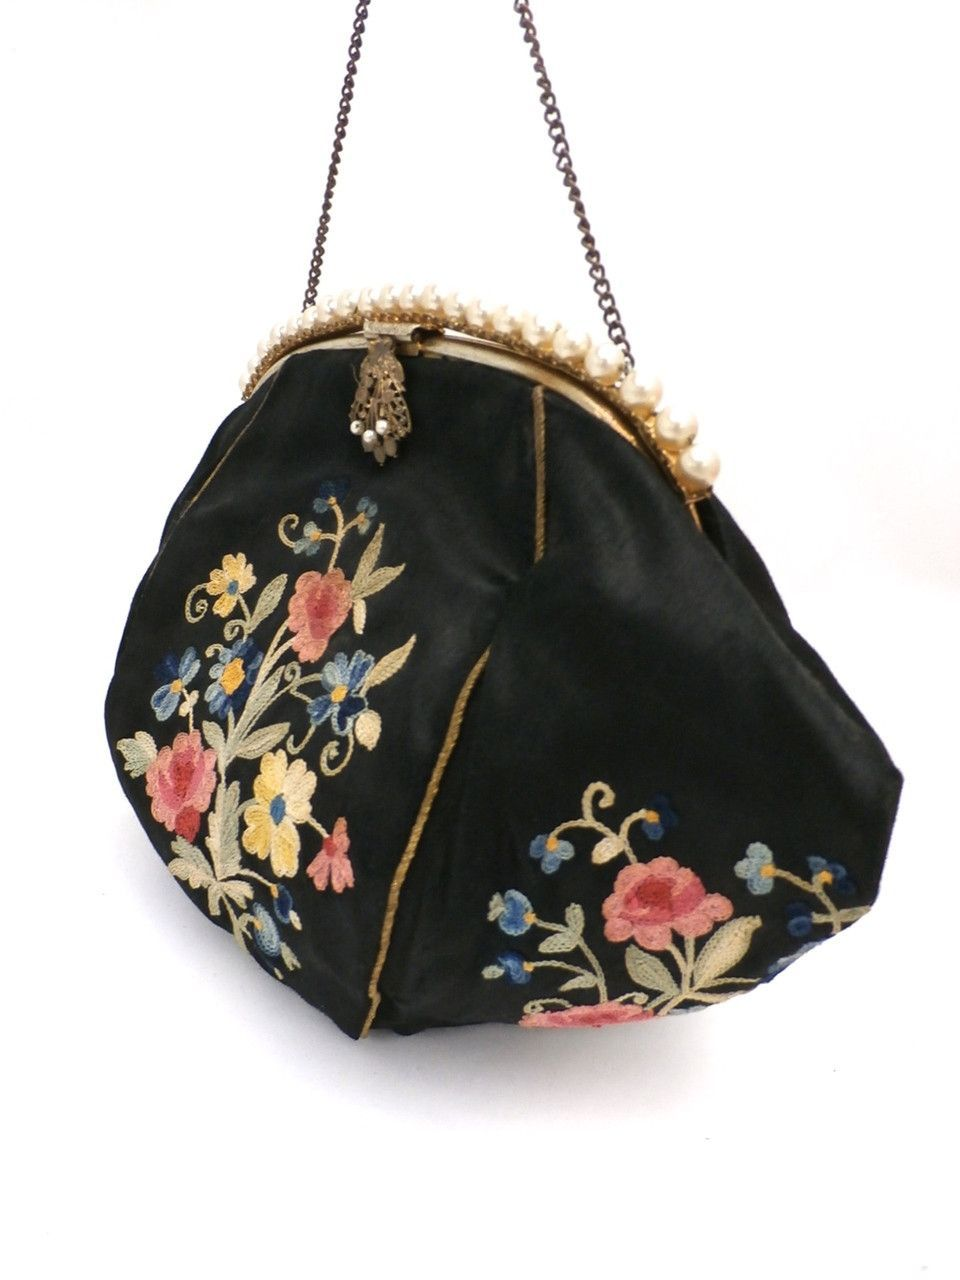 Vintage Evening Bag H A E Smith France Black Crewel Purse 1930s